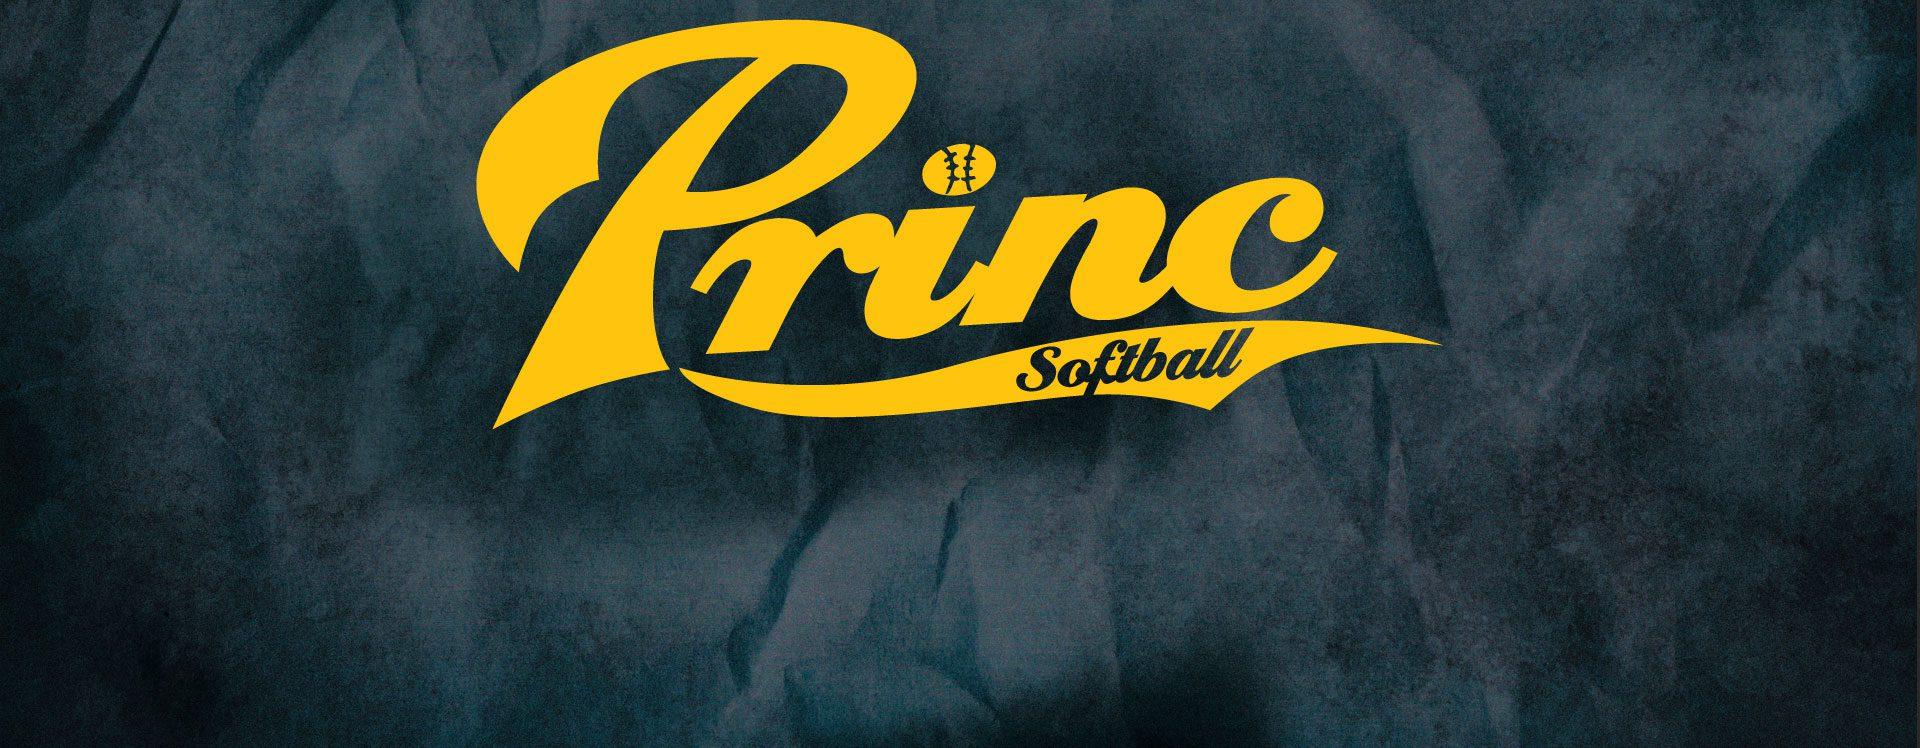 02slider-pozadina-softball-klub-princ-prvaci